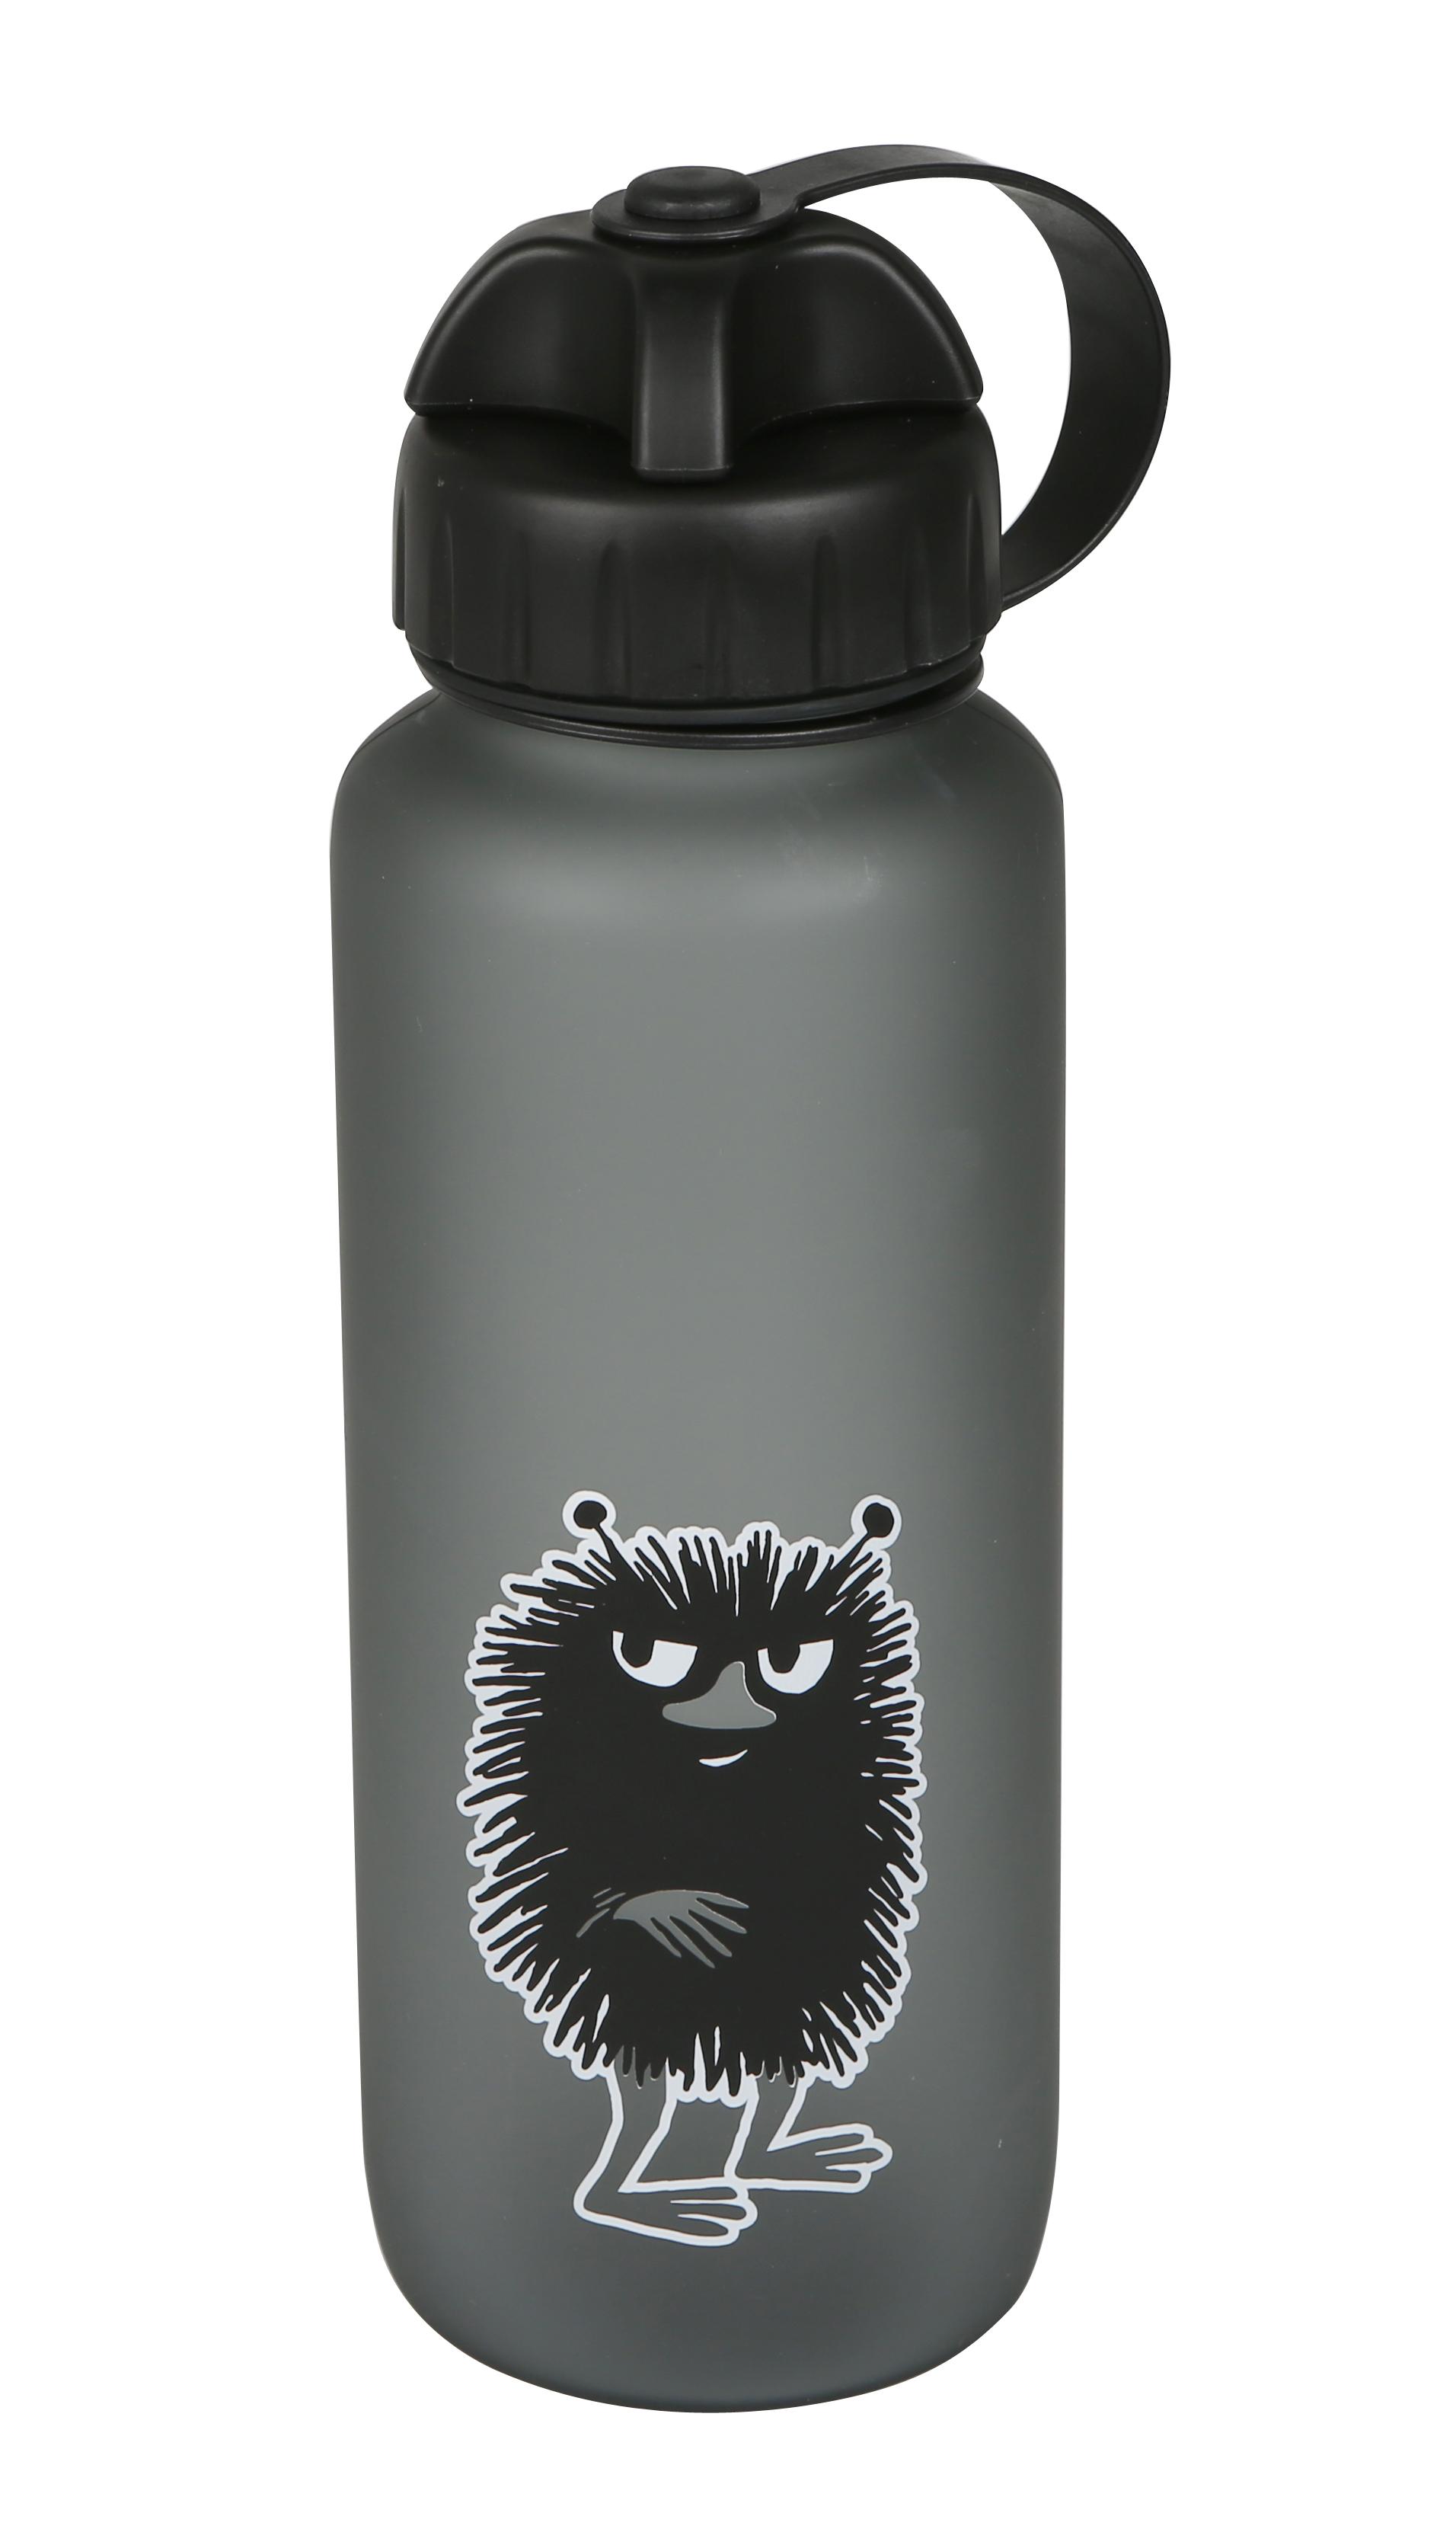 Martinex Stinky bottle gray